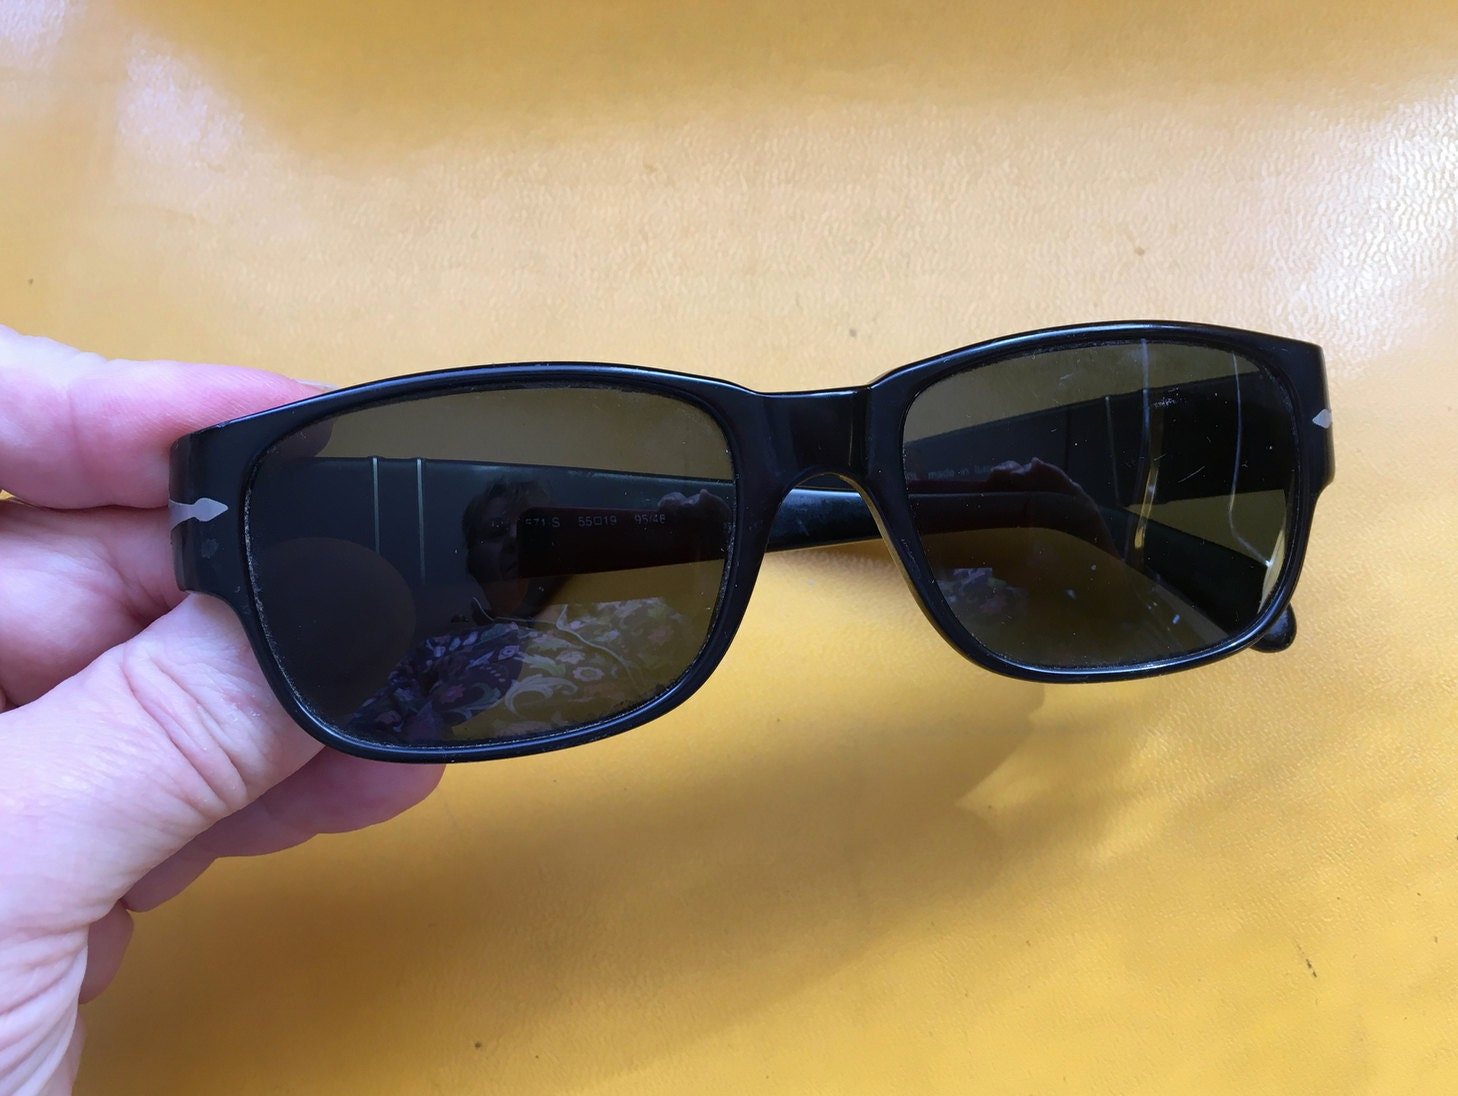 79ec3b3d63 Vintage Persol Sunglasses Retro Fashion Black Rectangle Lens